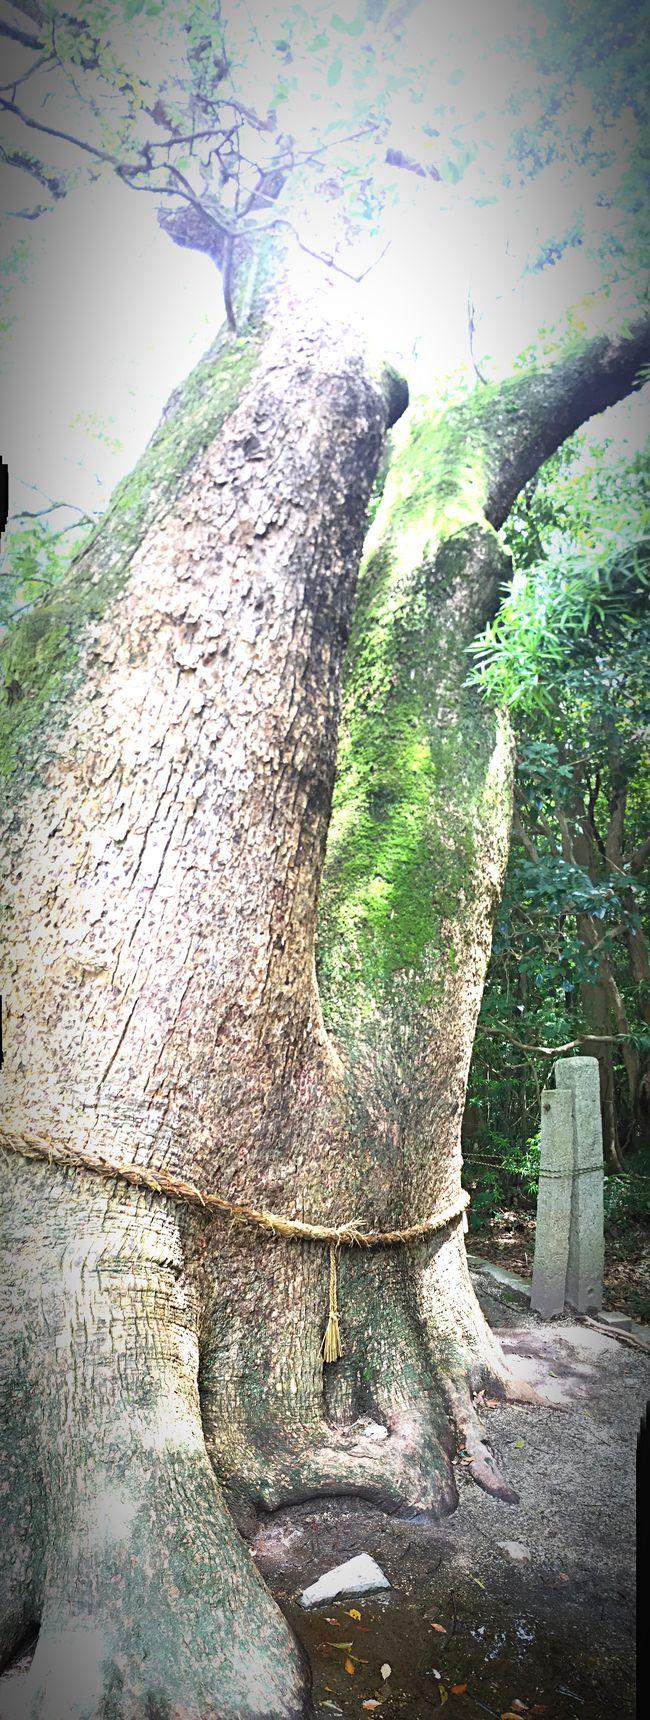 Taking Photos Relaxing IPhoneography Awaji Awaji Island